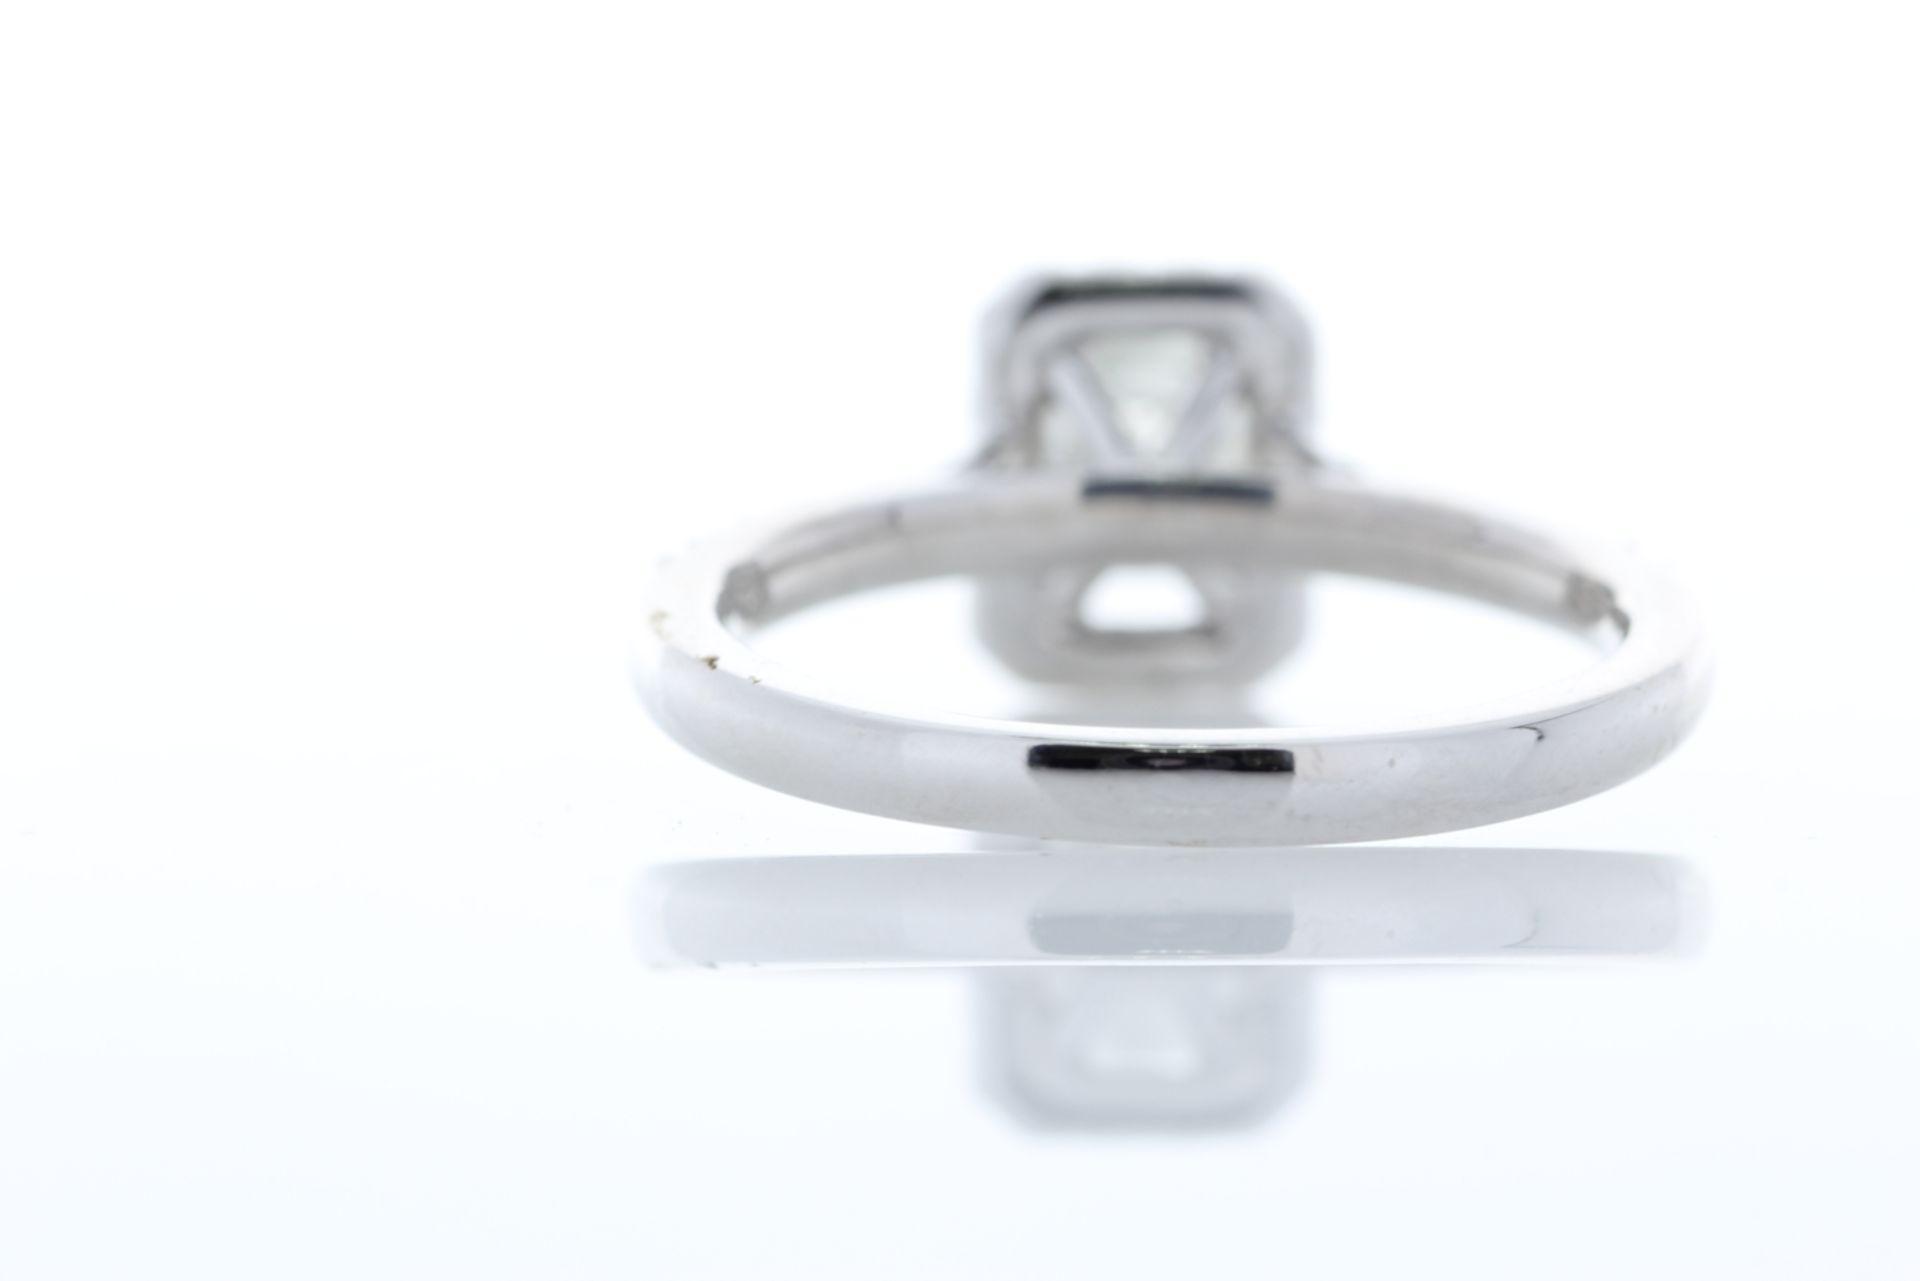 Lot 34 - 18k White Gold Single Stone Radiant Cut With Halo Stone Set Shoulders Diamond Ring (1.01) 1.32